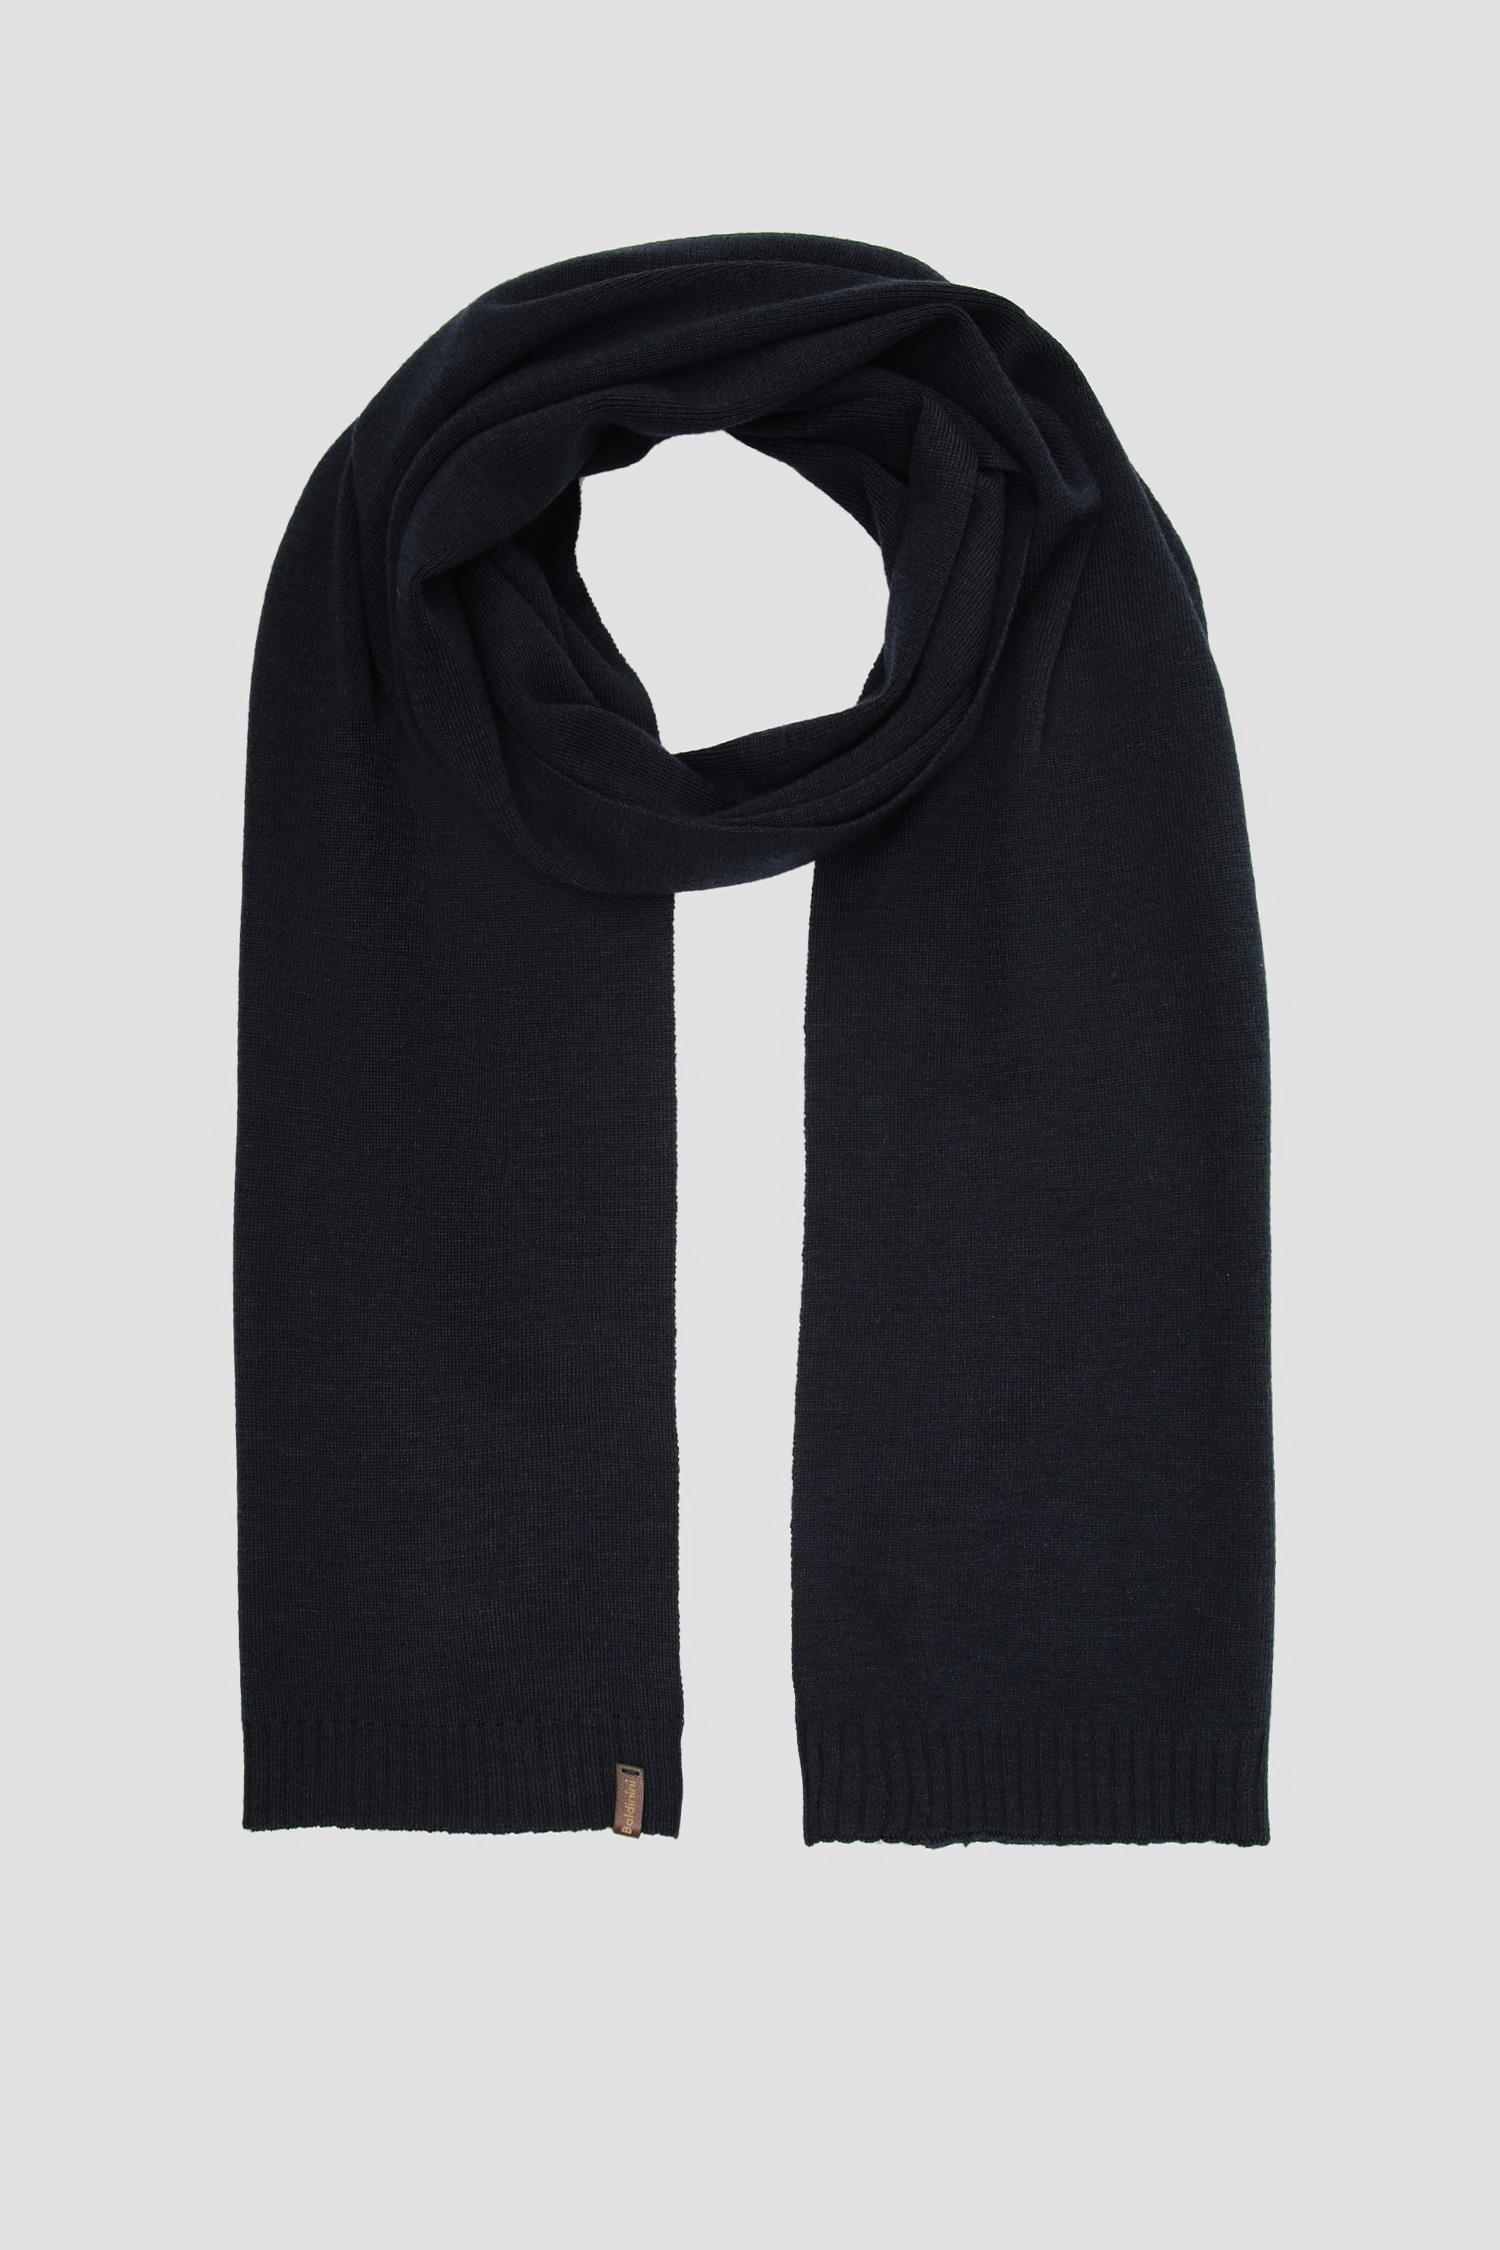 Мужской темно-синий шерстяной шарф Baldinini 128004;10